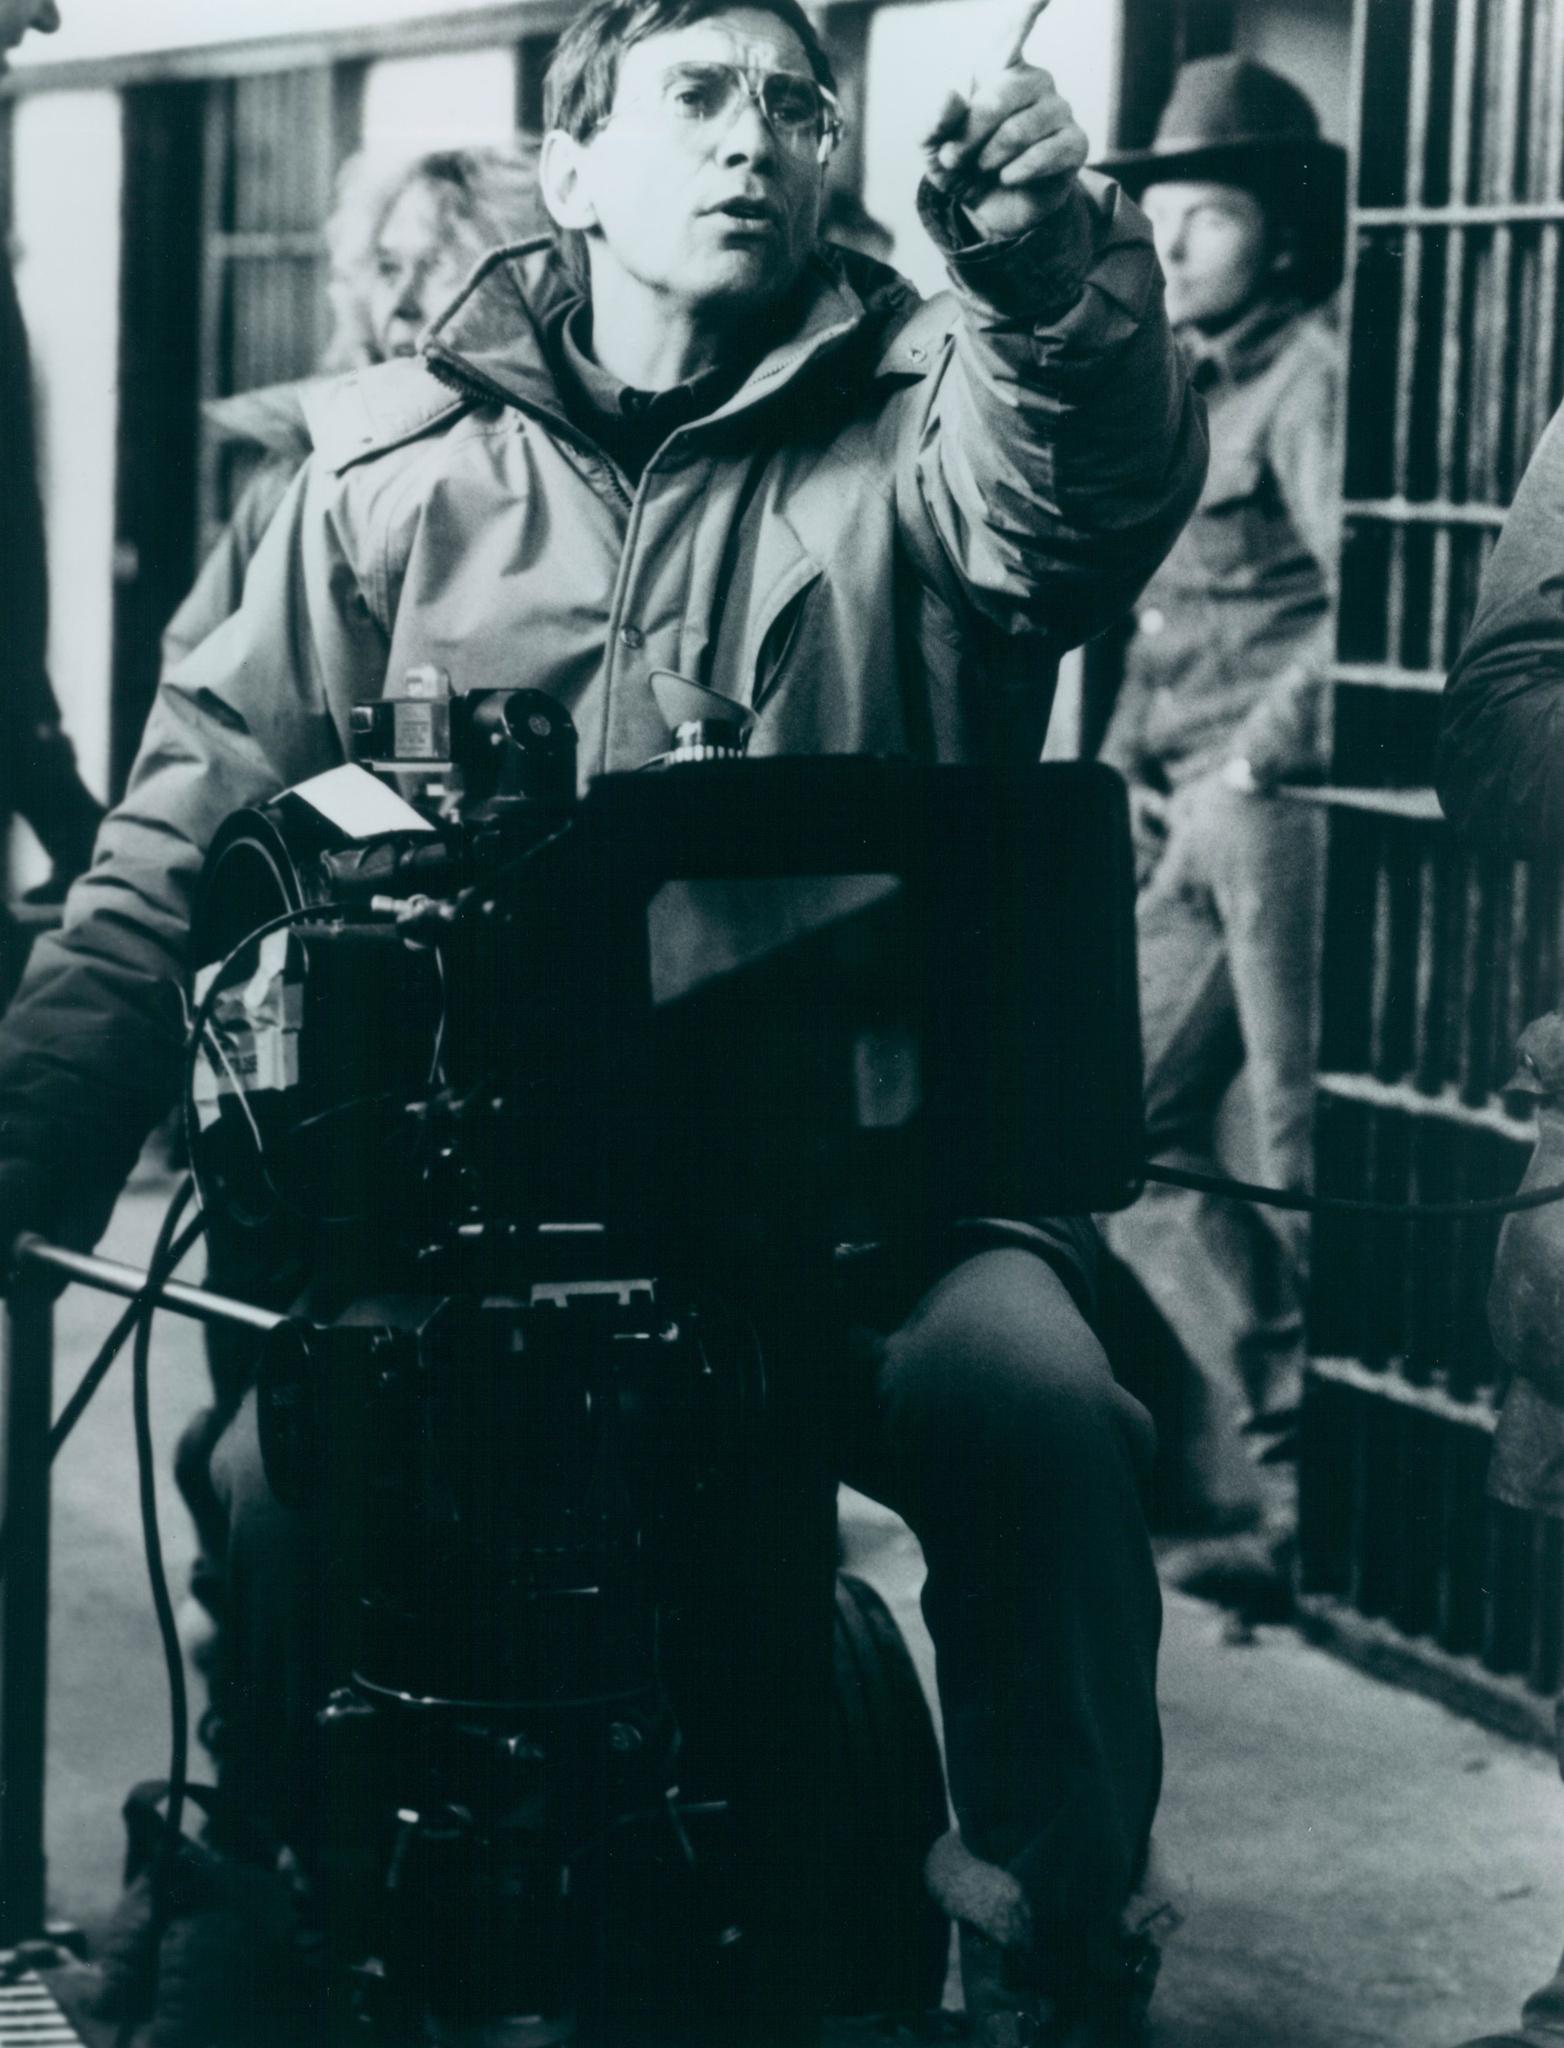 Andrey Konchalovskiy in Runaway Train (1985)